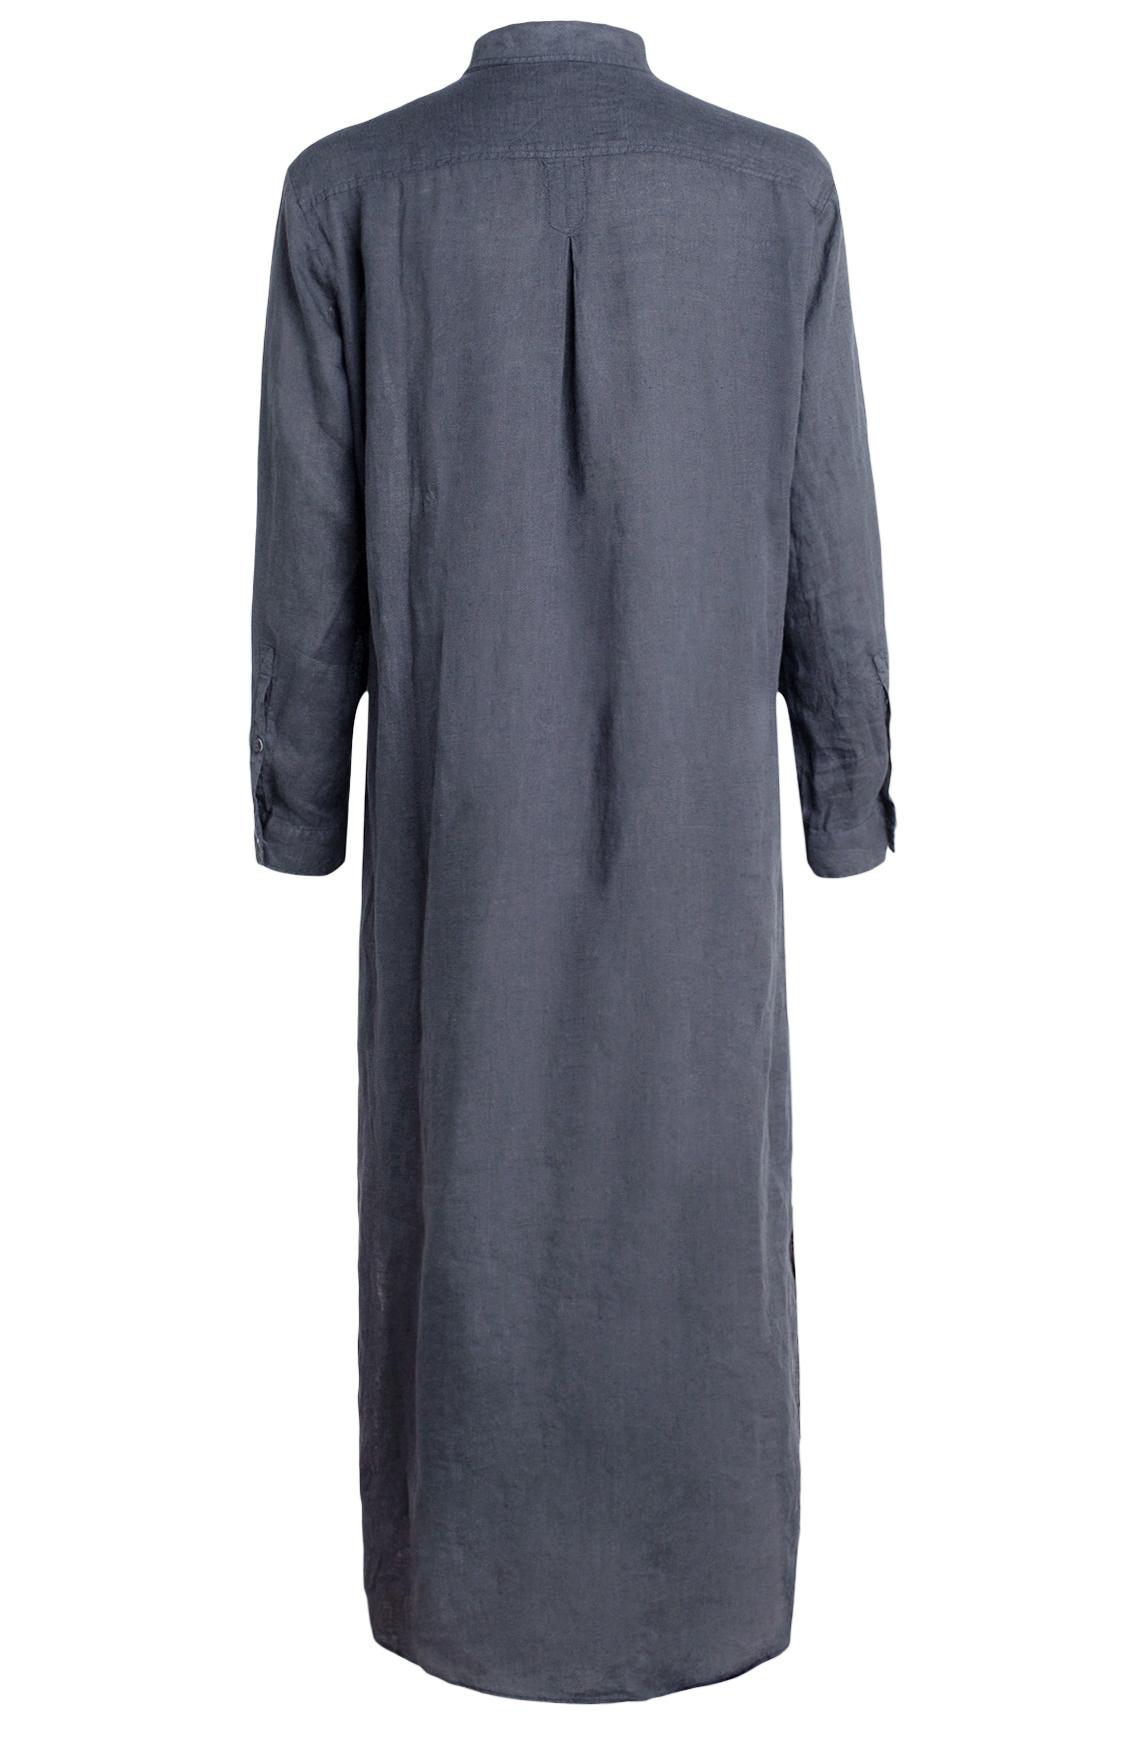 Moscow Dames Lange blousejurk Blauw